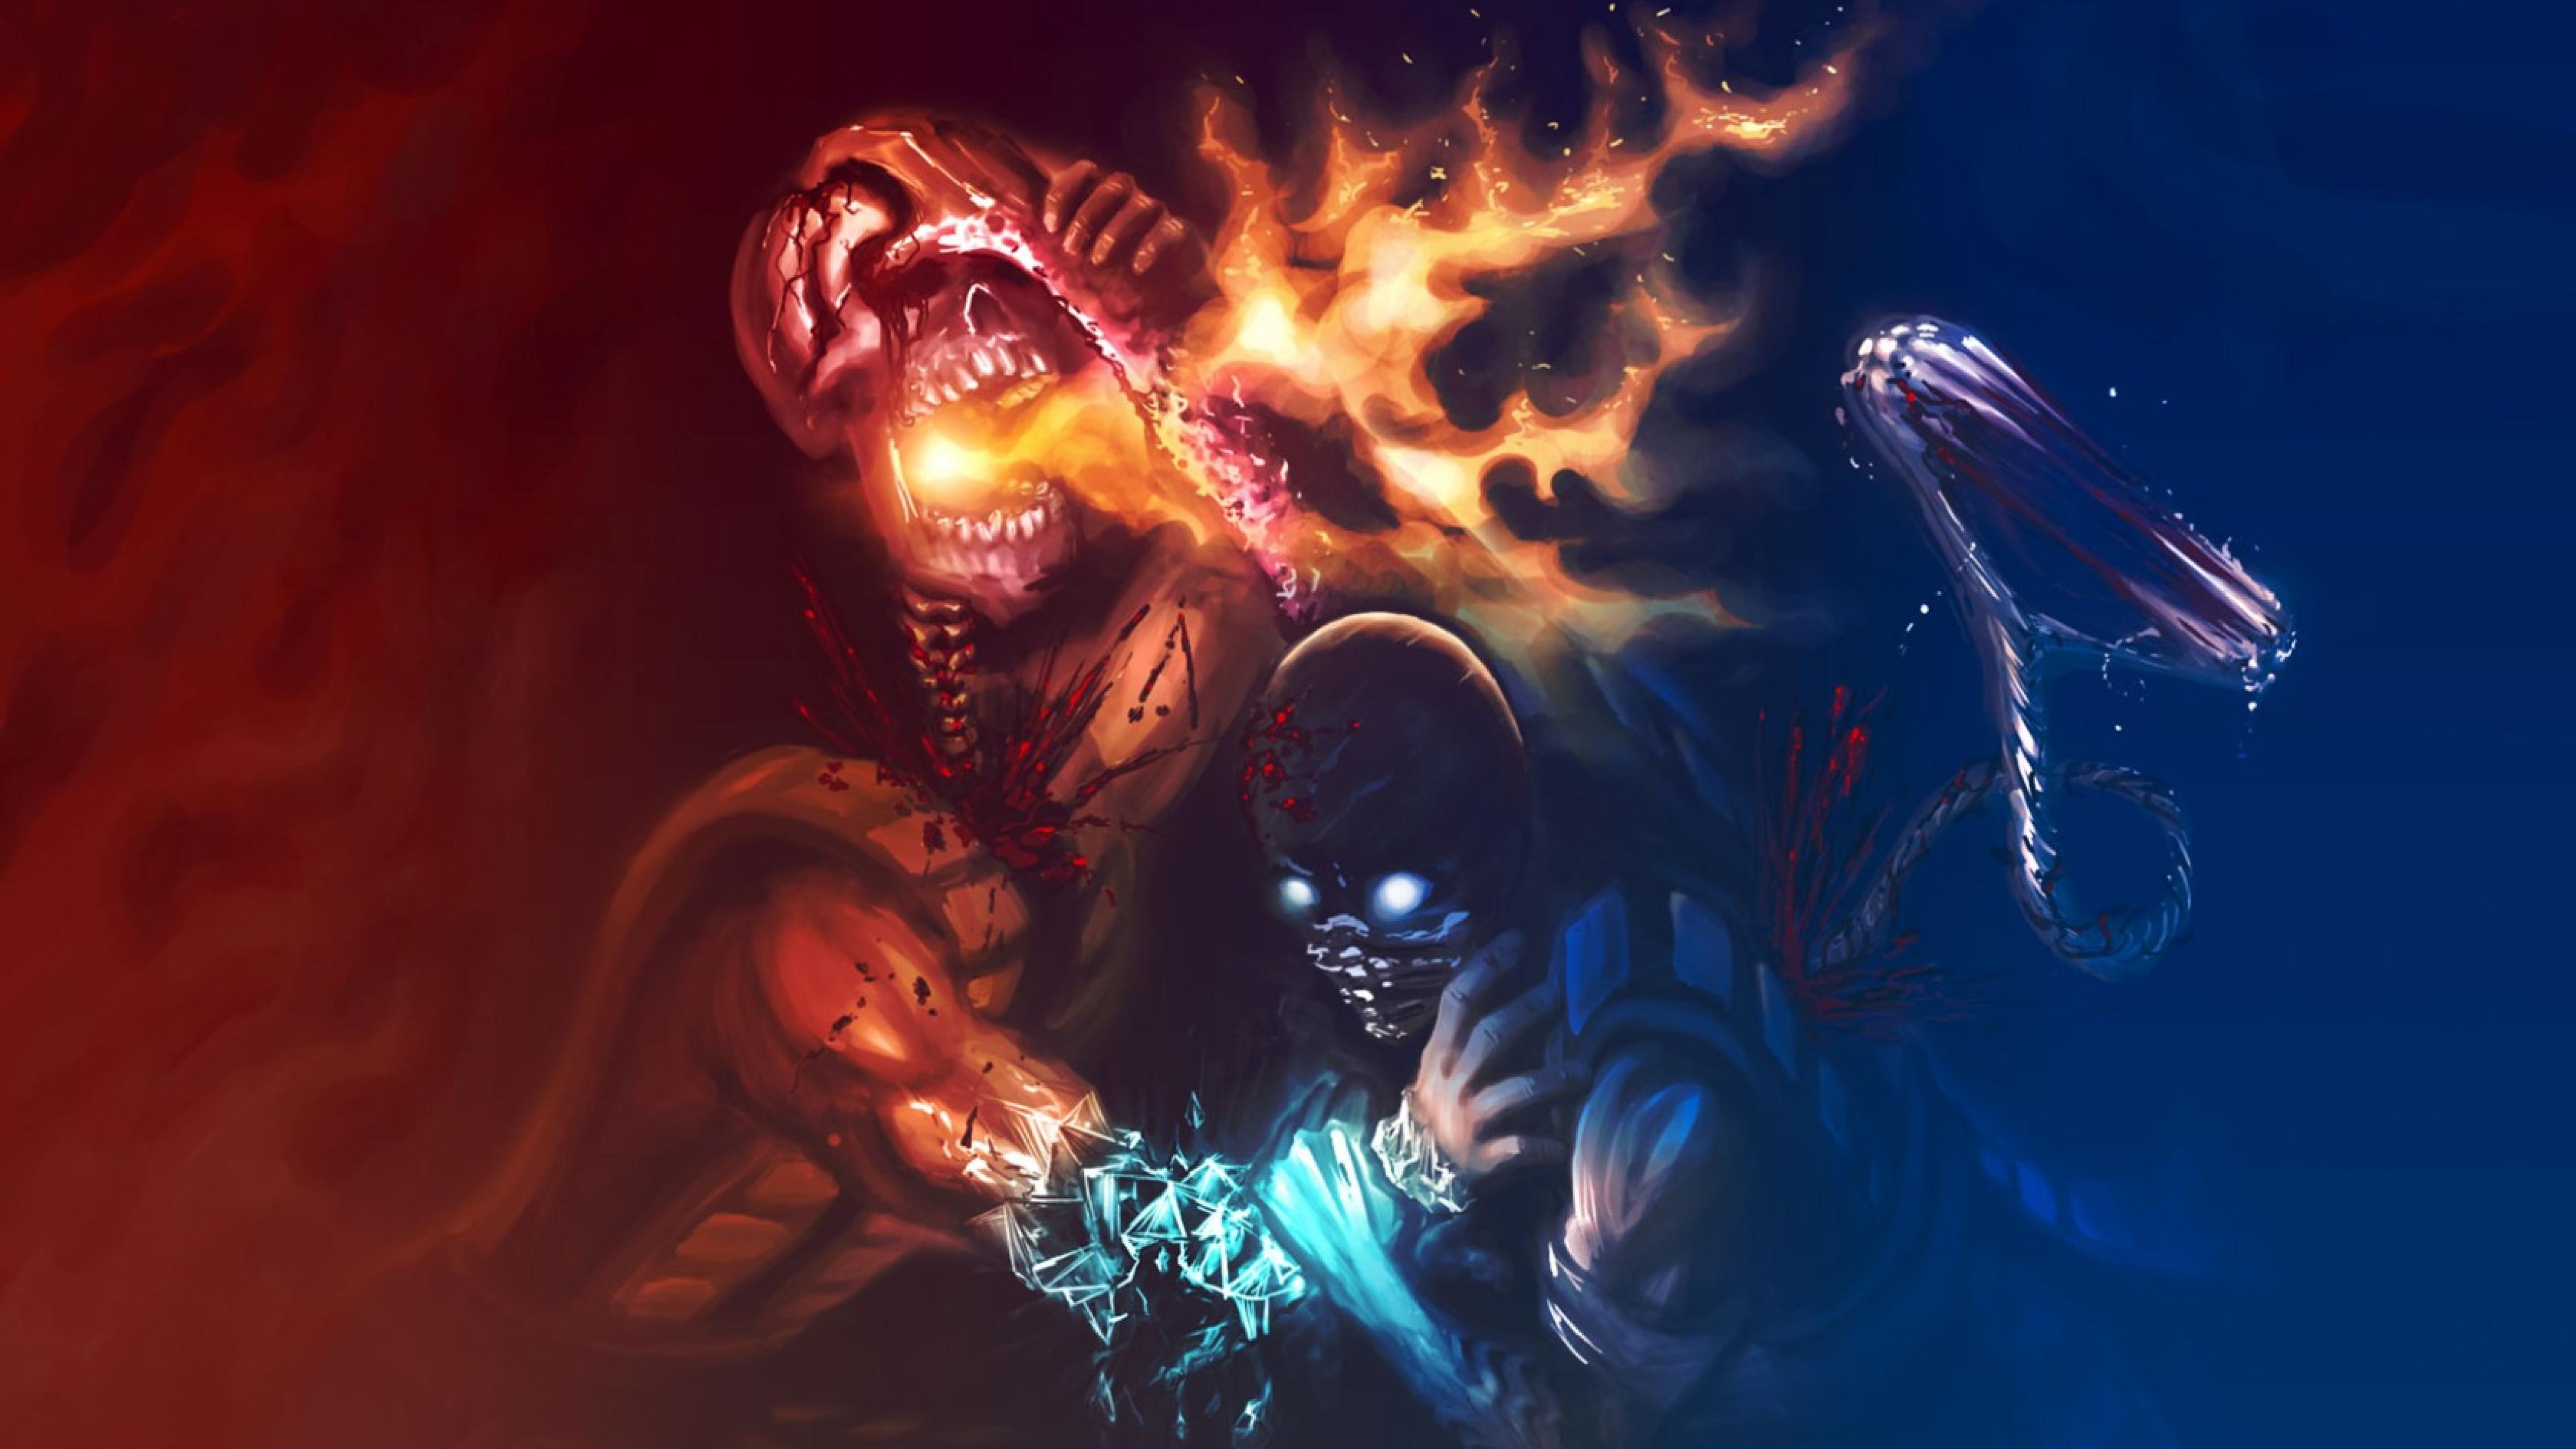 5120x2880 Mortal Kombat Scorpion Sub Zero 5k Wallpaper Hd Games